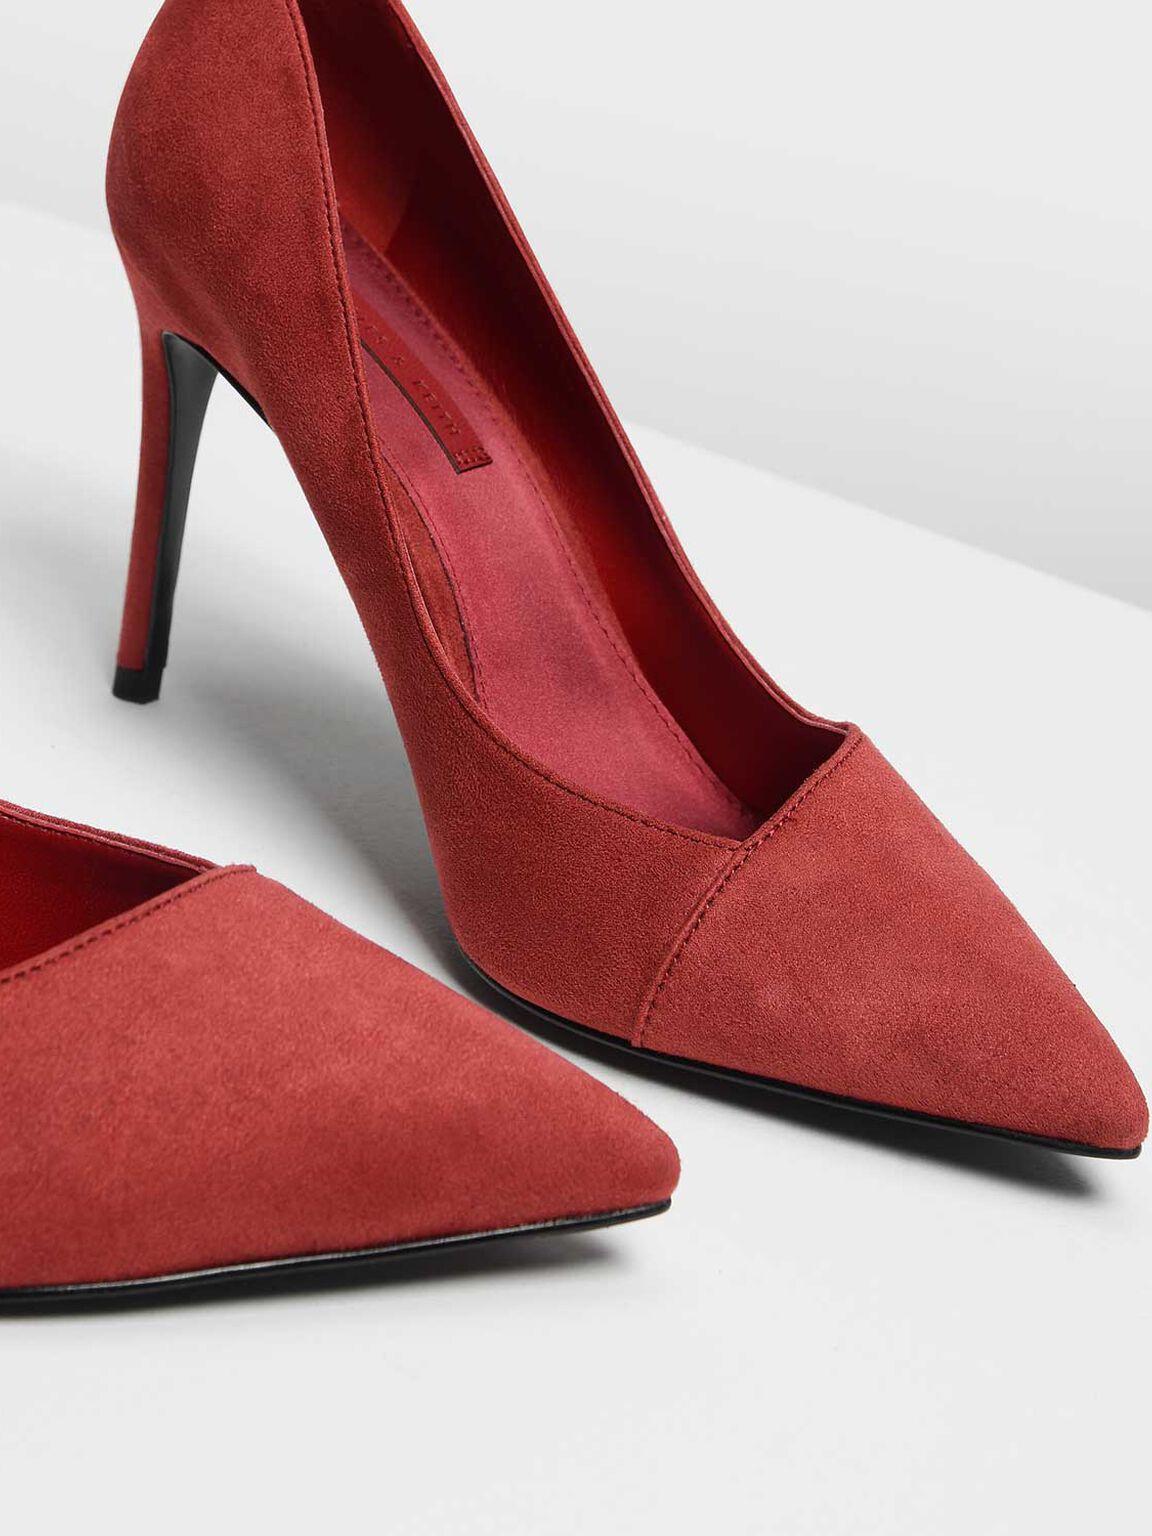 Asymmetrical Cut Stiletto Pumps, Red, hi-res